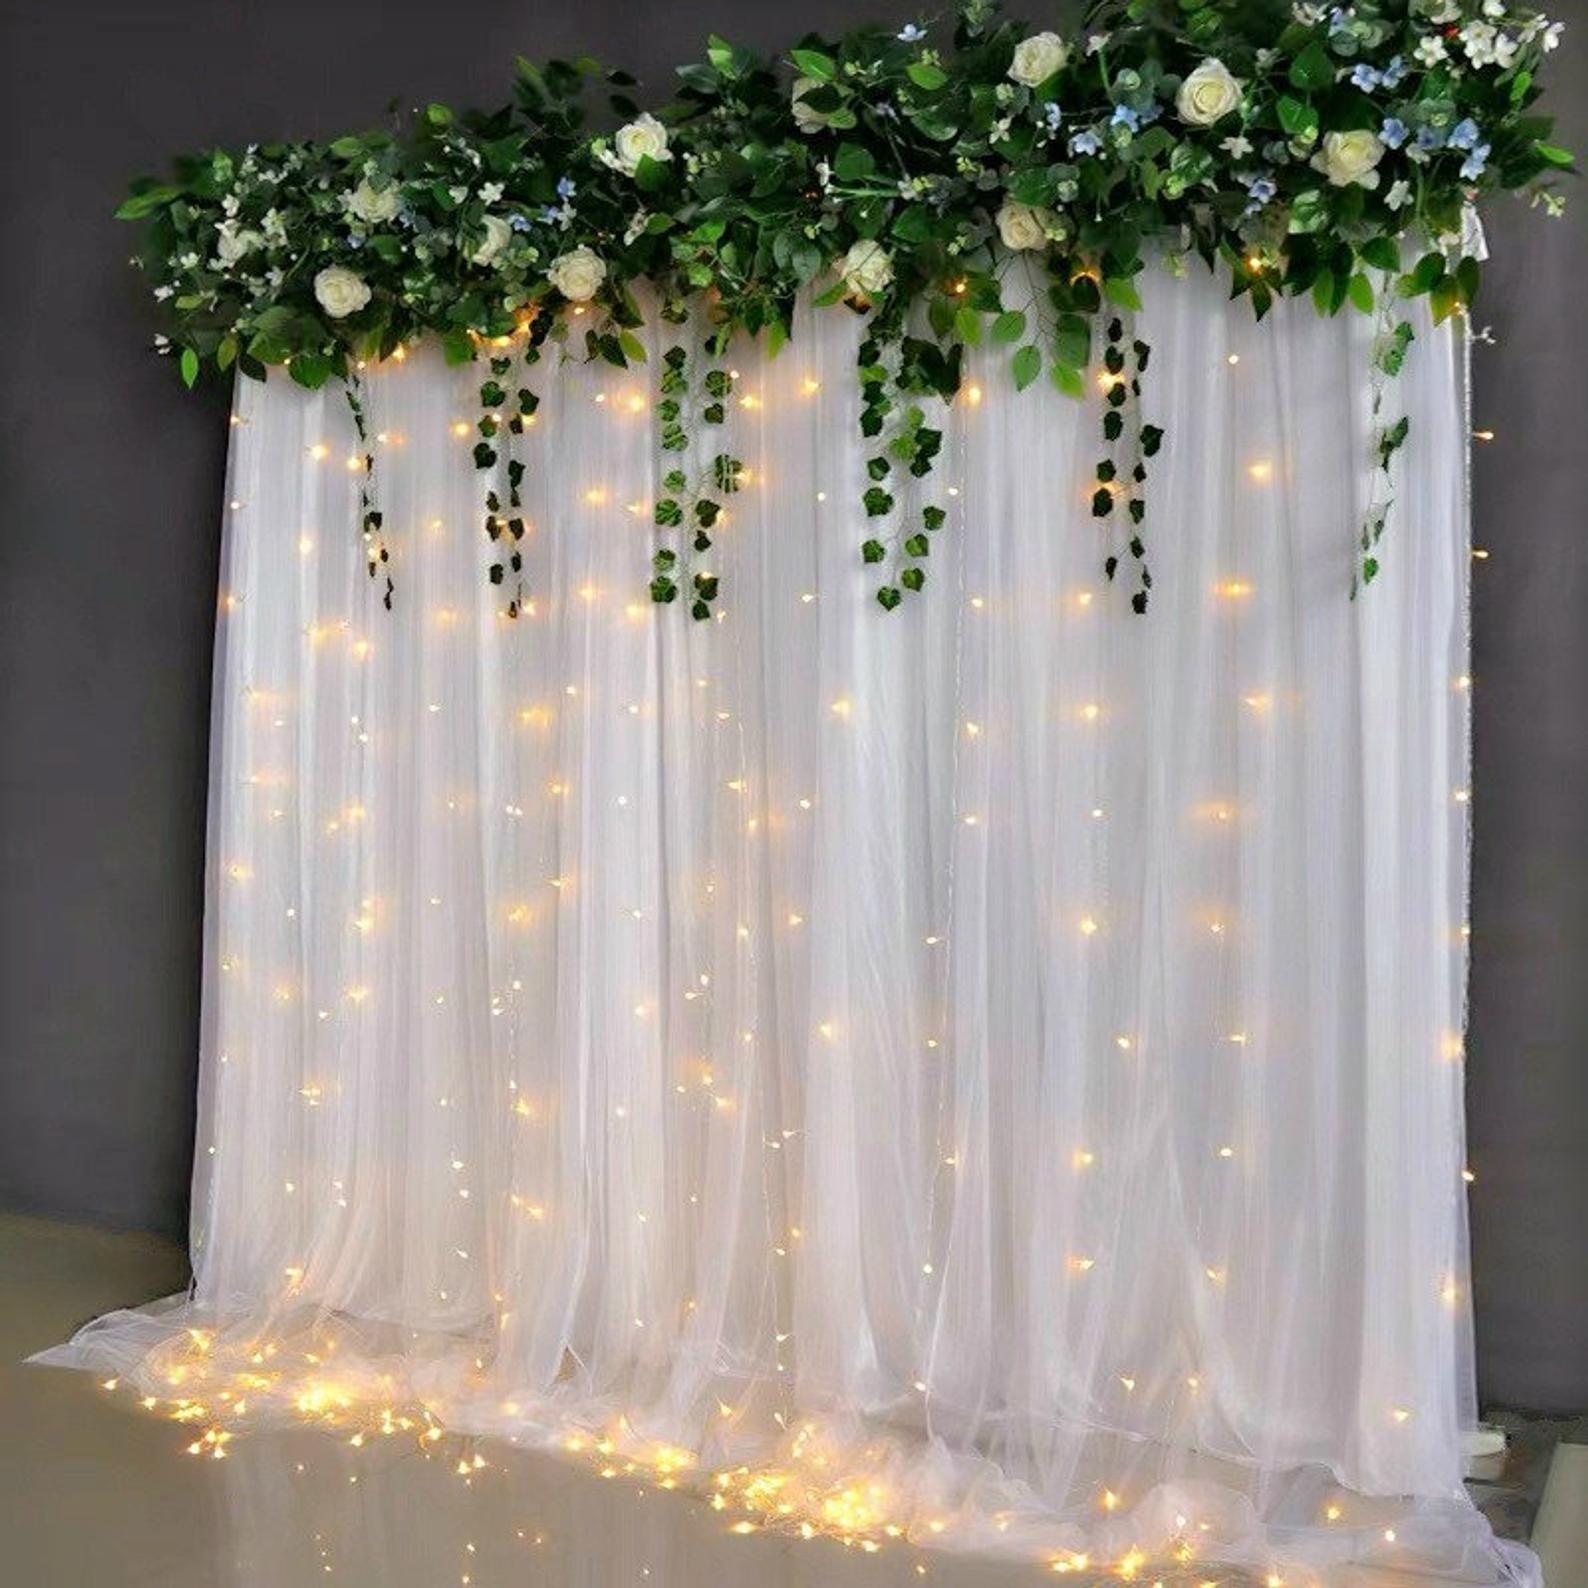 Wedding Backdrop Curtain Wedding Backdrop Fabric Tulle Etsy In